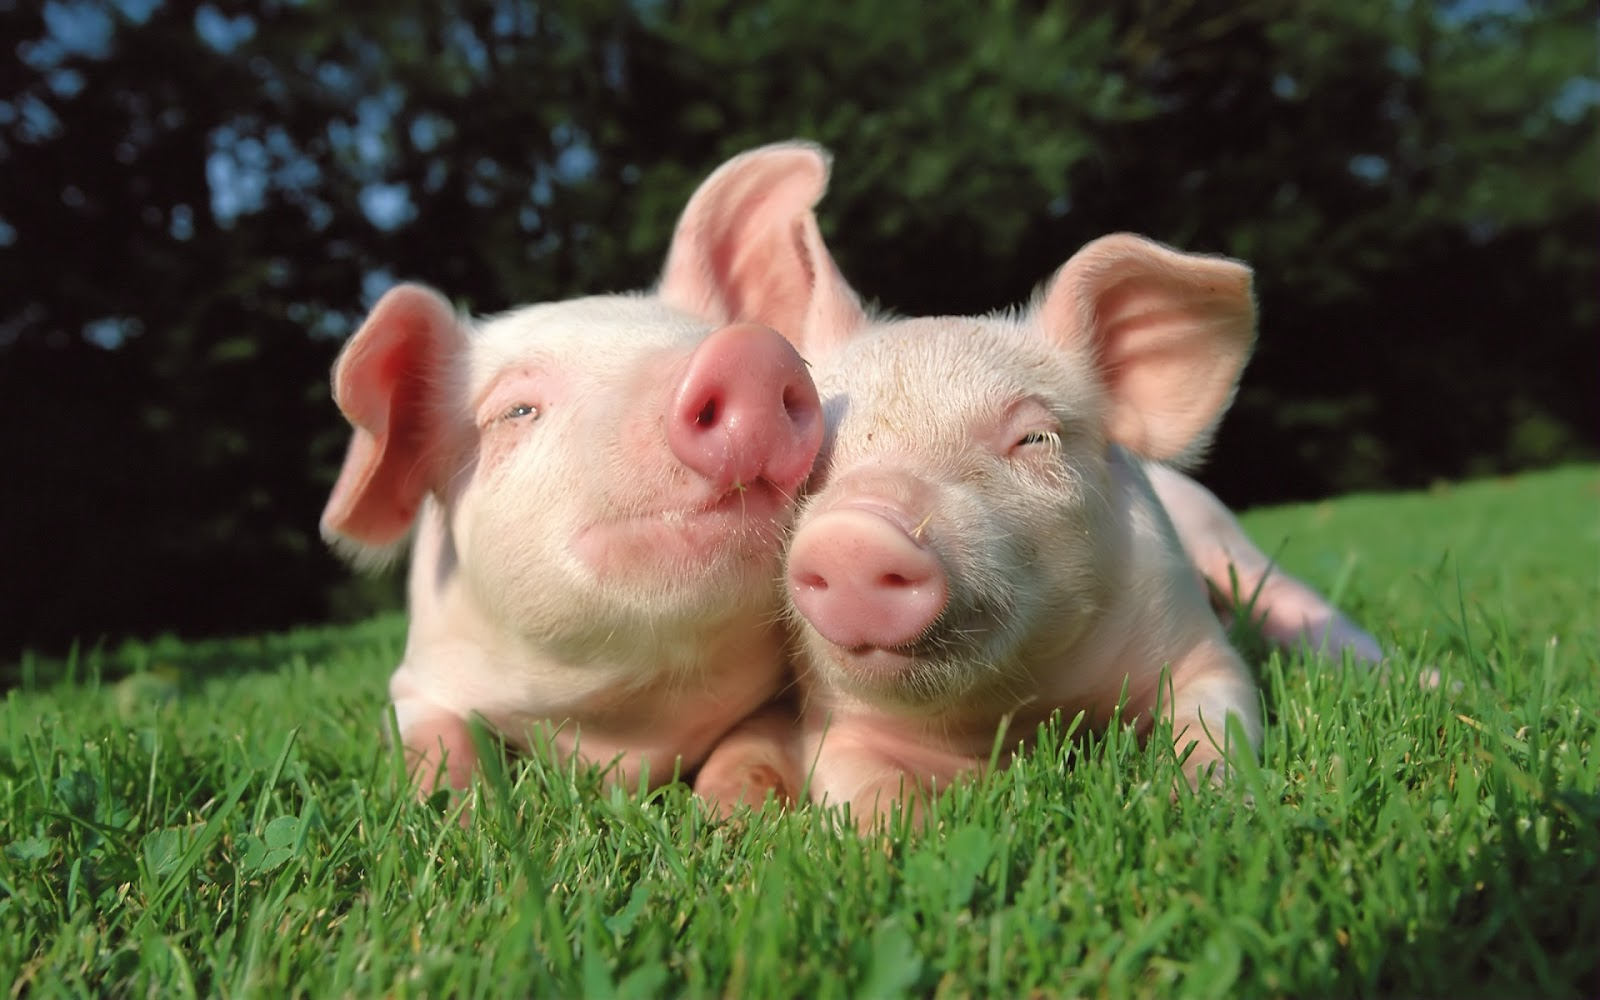 Pigs | Fun Animals Wiki, Videos, Pictures, Stories  Pigs | Fun Anim...